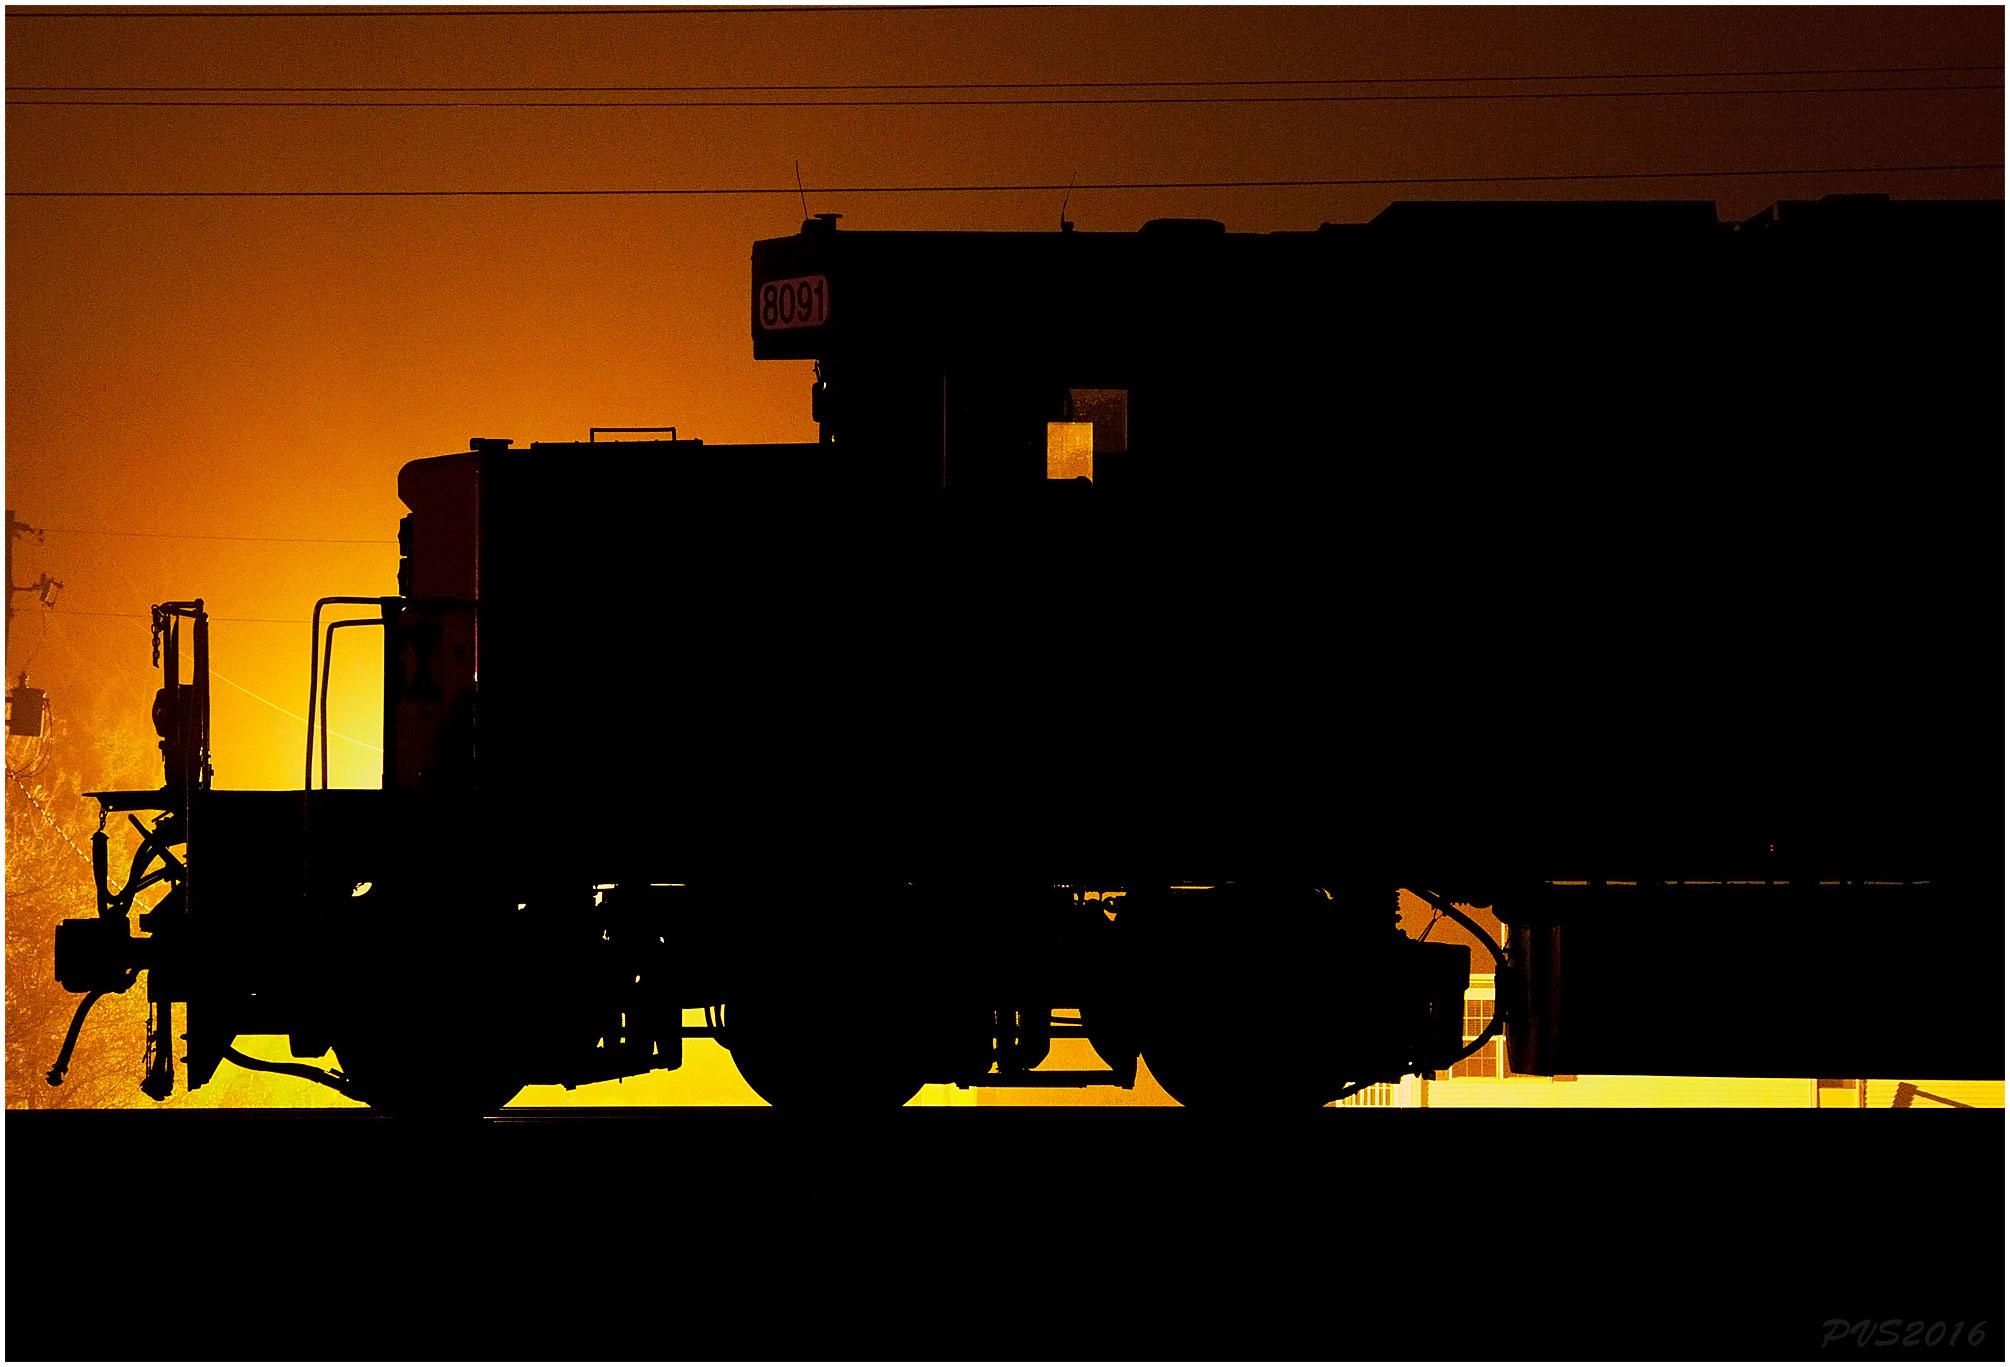 2010x1367 Wallpaper Dark, Silhouette, Train, Skyline, Backlighting